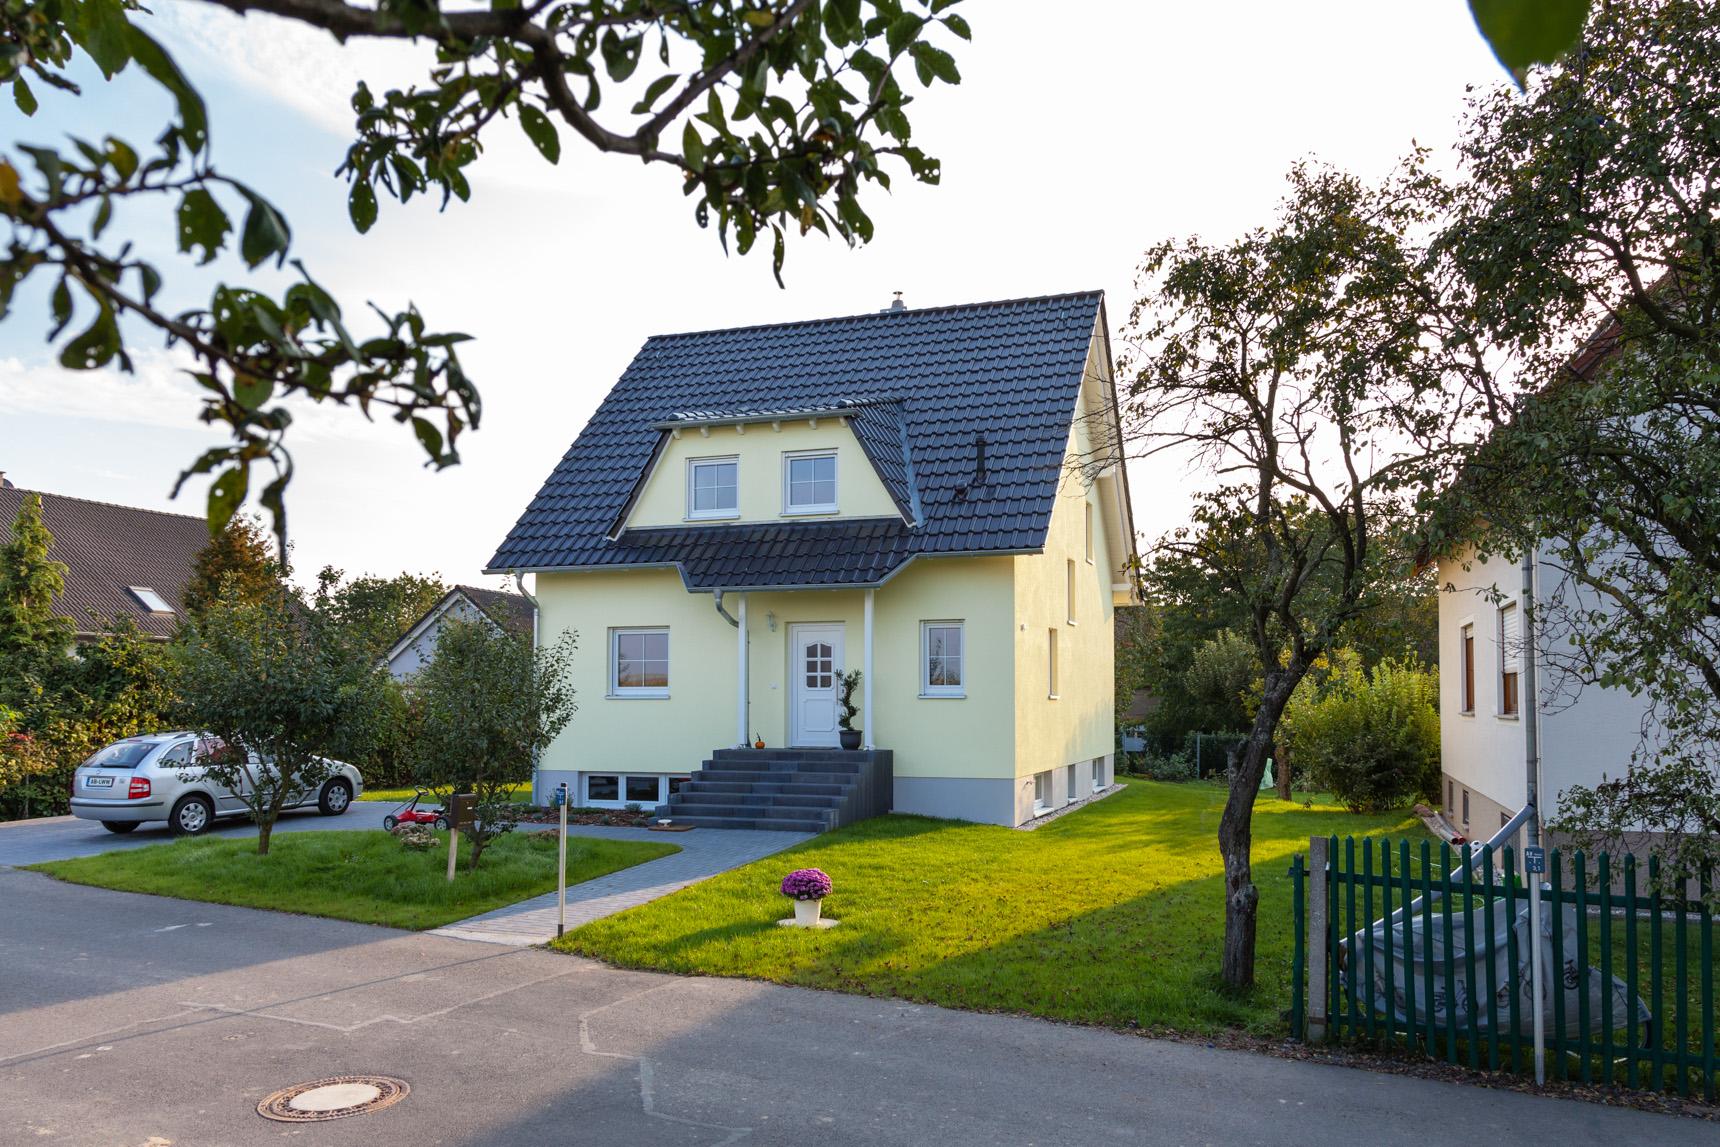 Referenz - Großpösna - AGL Massivhaus Projektbau GmbH